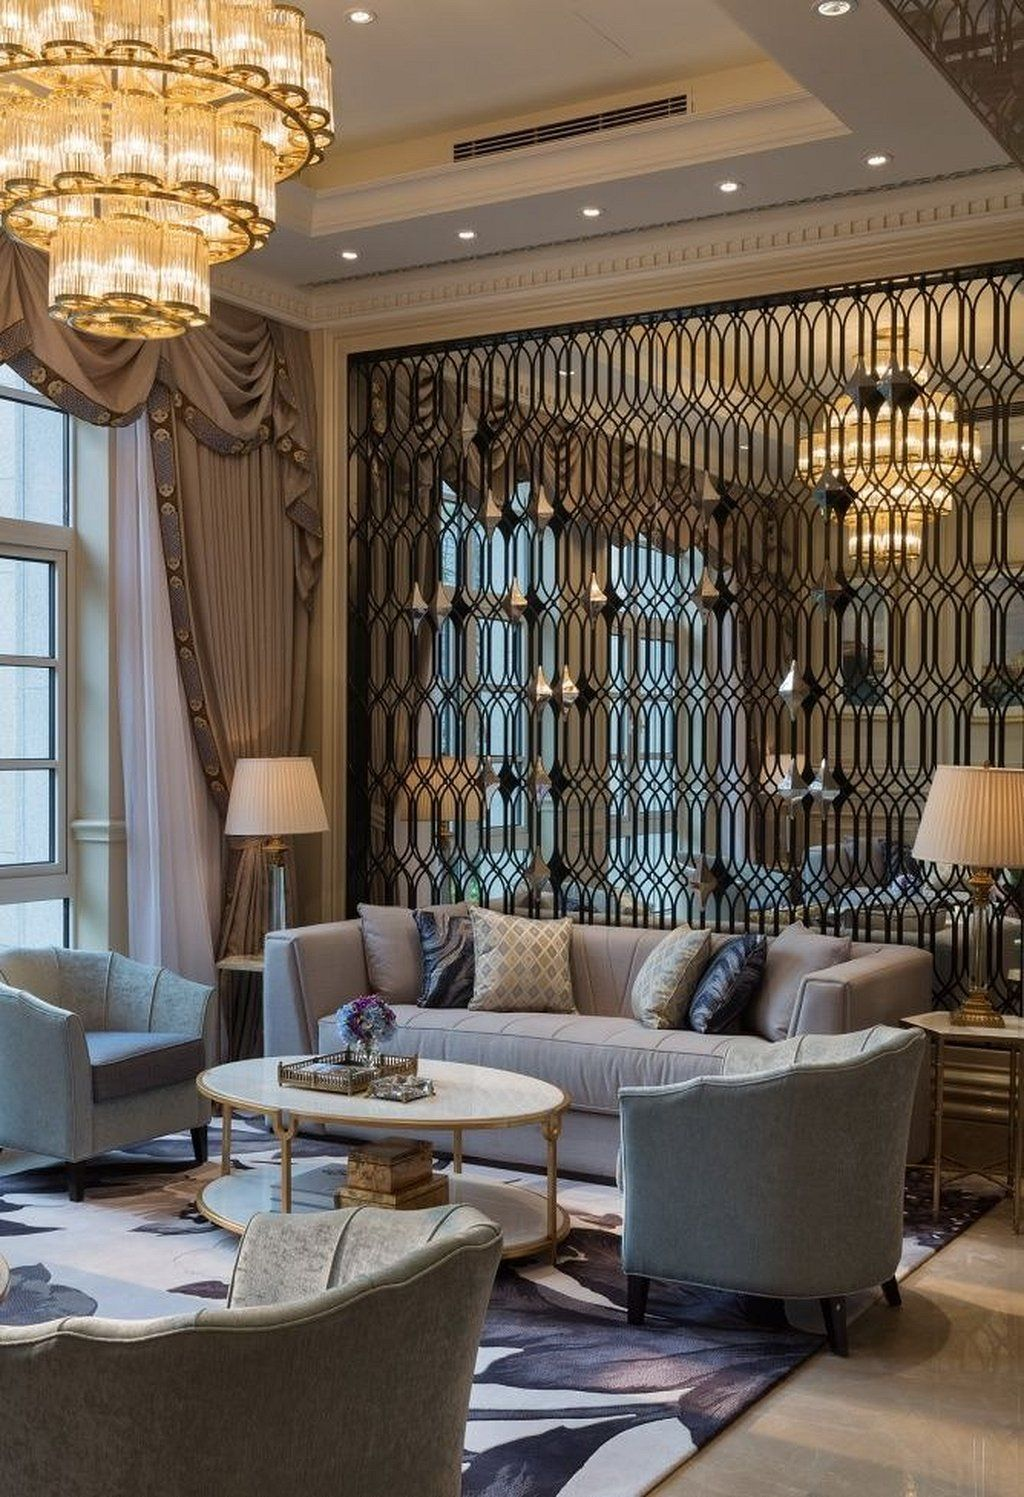 29 Living Room Interior Design: Best 29 Corporate Office Design Executive